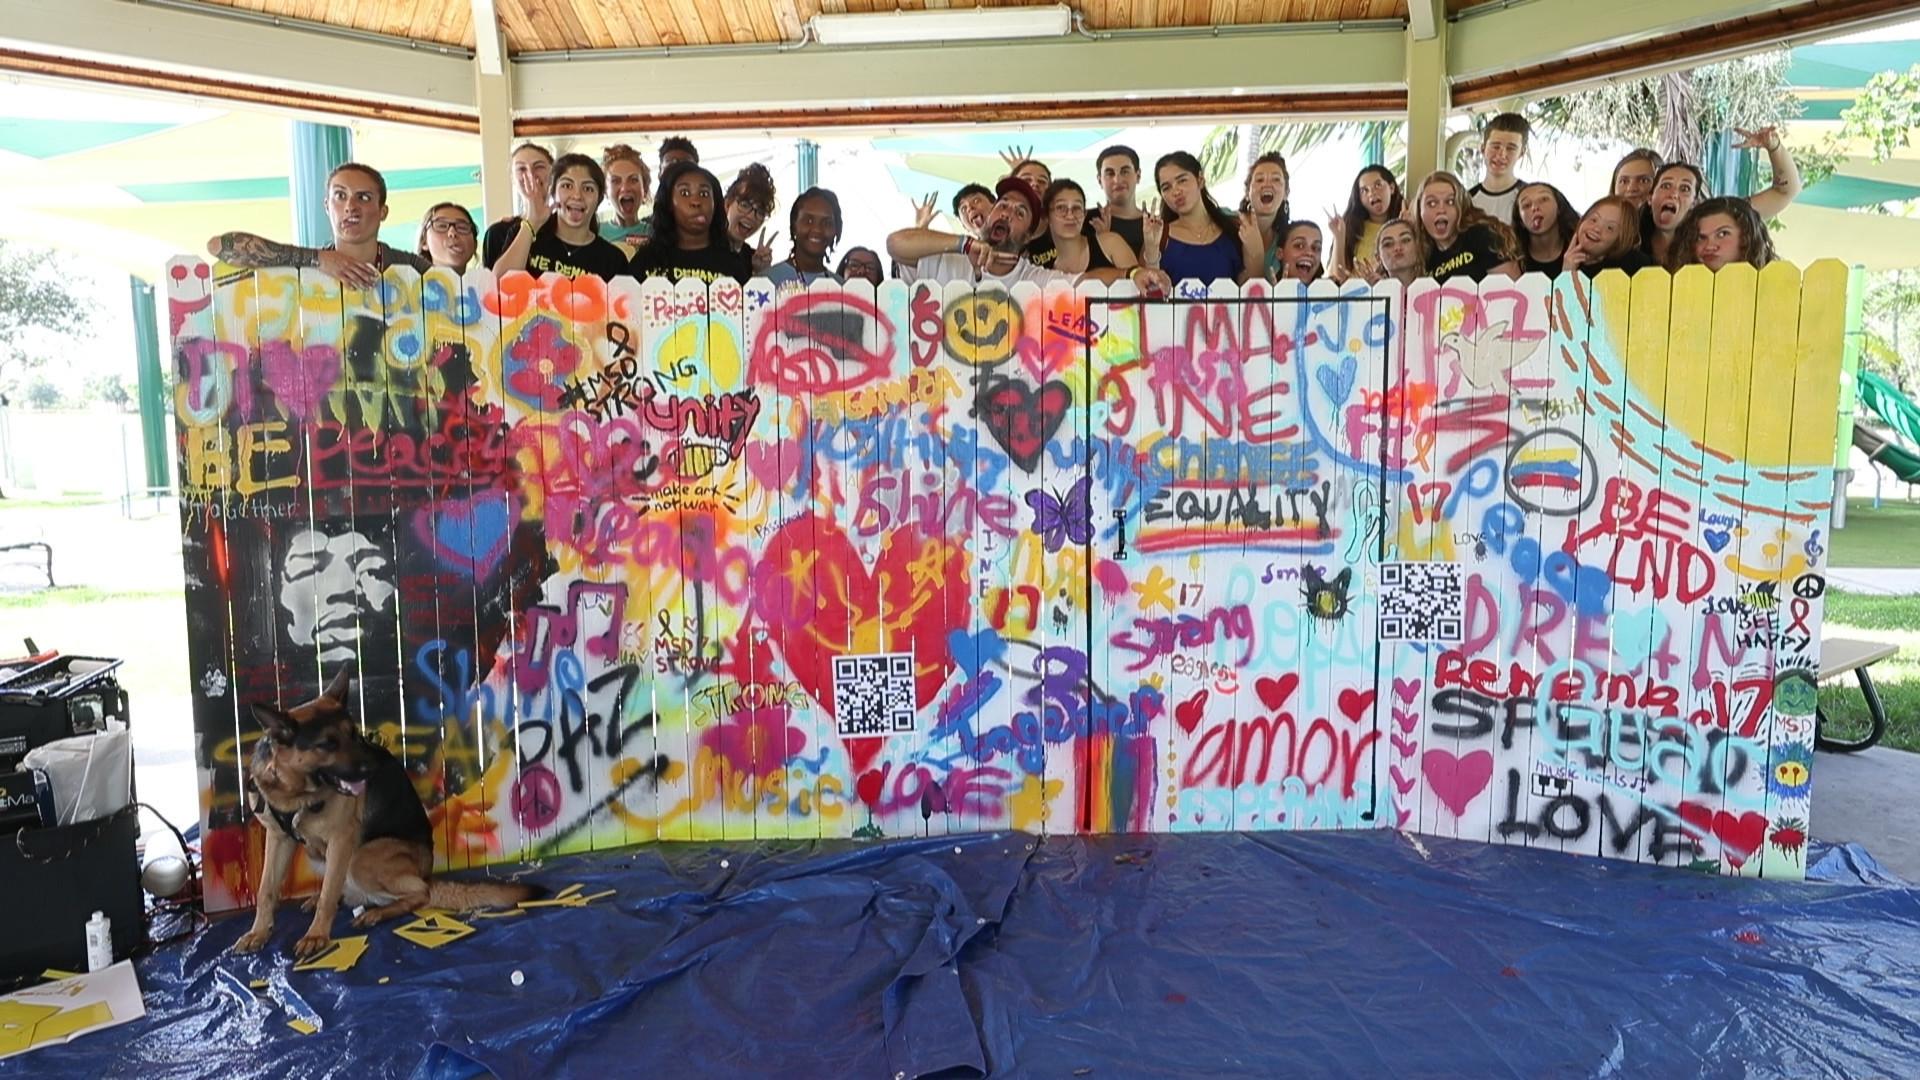 Father Of Slain Stoneman Douglas Student And Peers Use Art